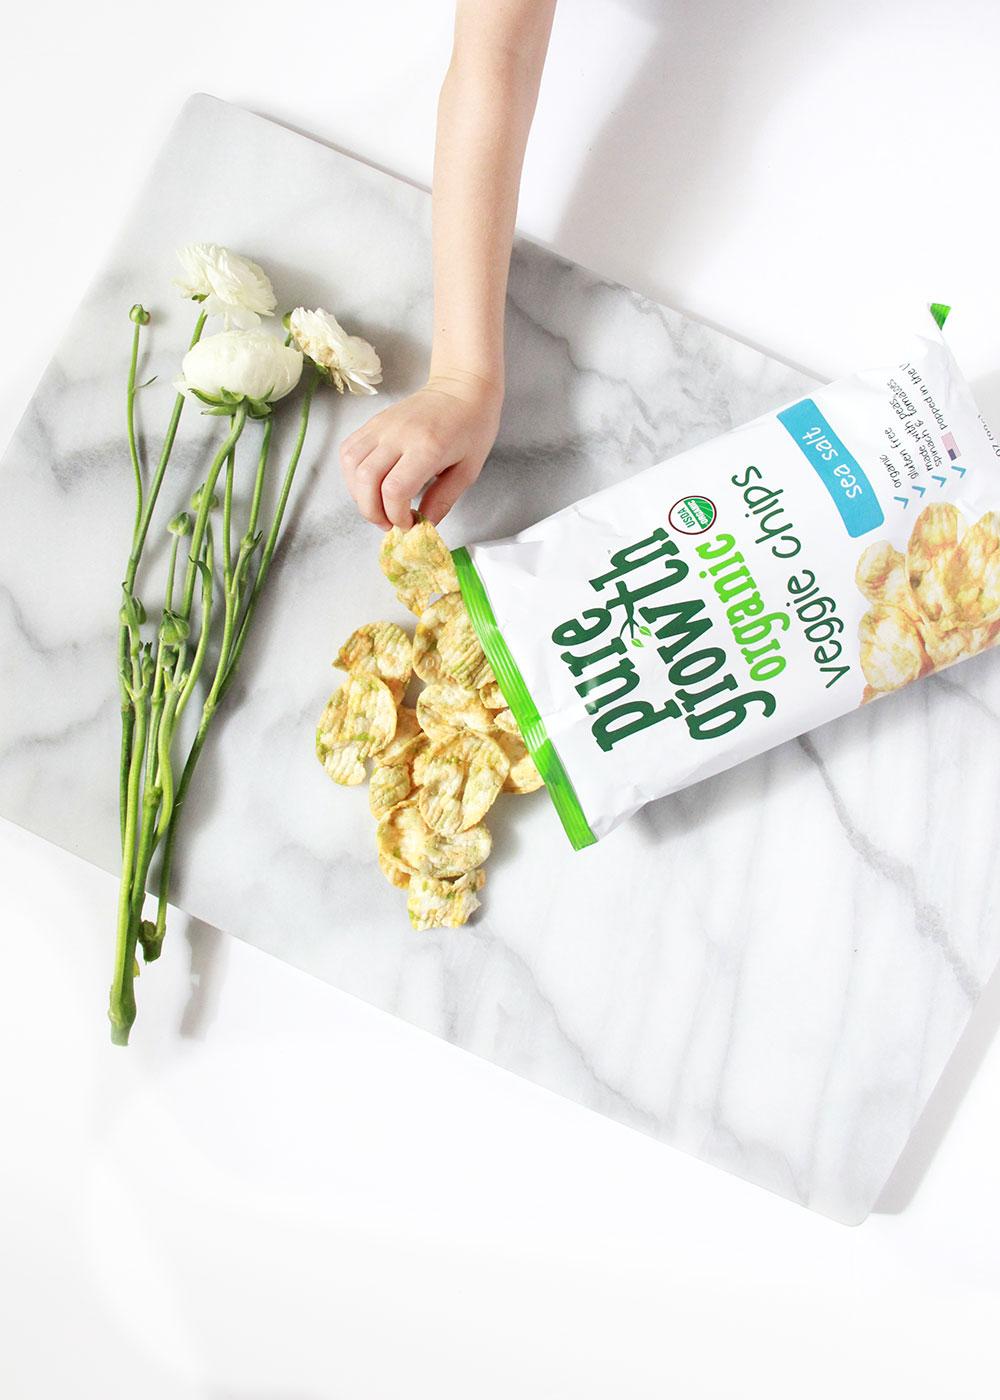 pure growth organic snack attack | thelovedesignedlife.com